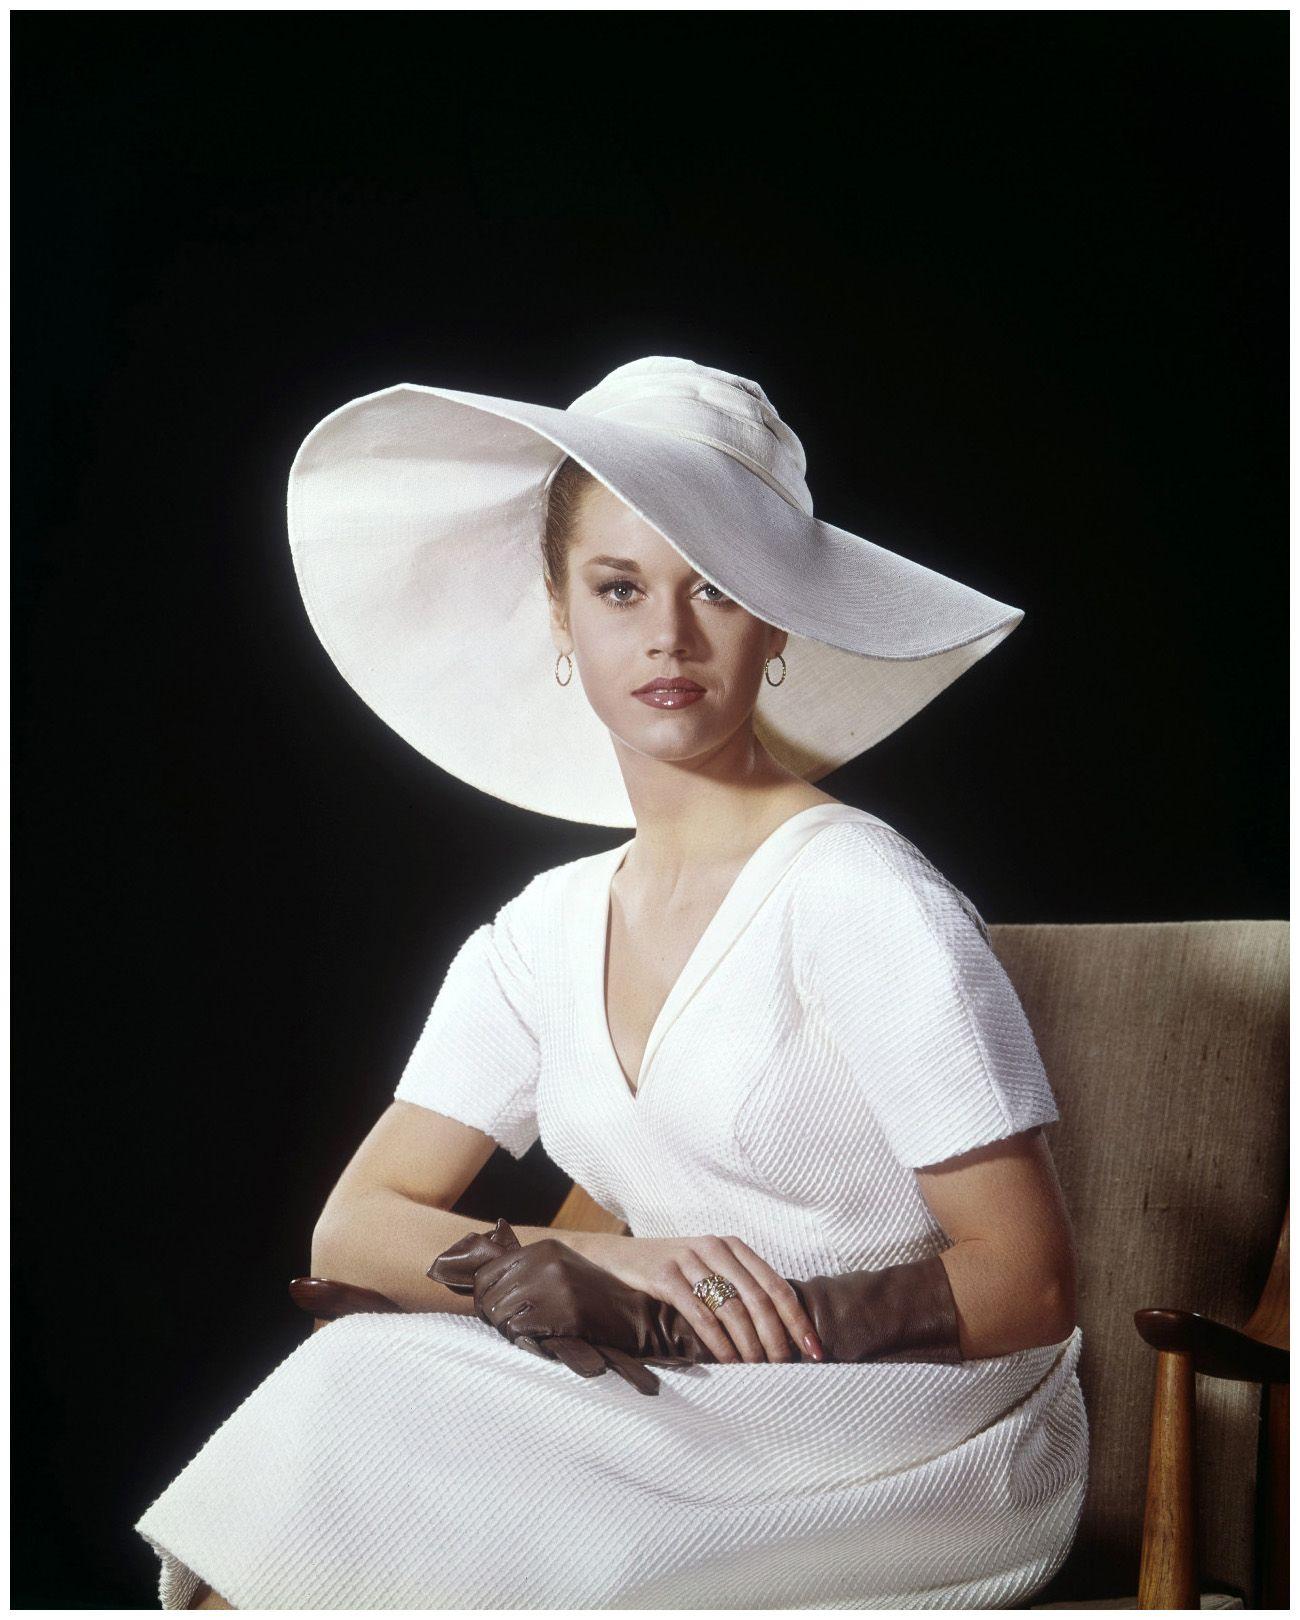 Jane Fonda publicity still for the Warner Brothers film